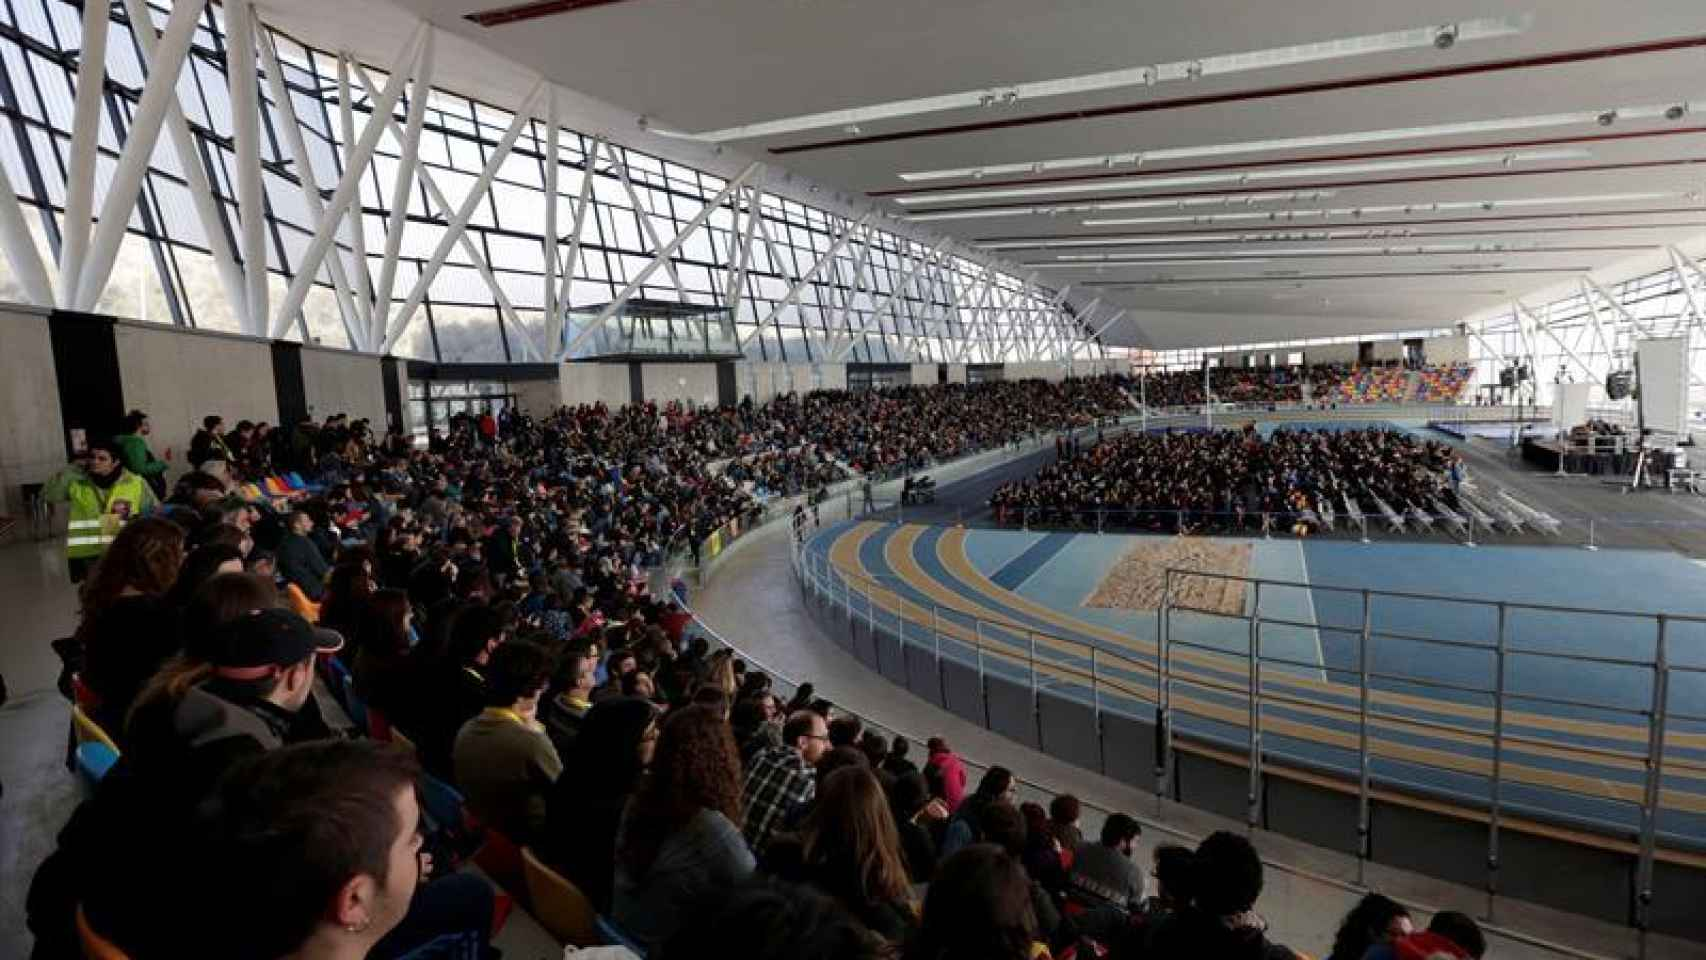 Vista panorámica de la asamblea de la CUP en Sabadell.